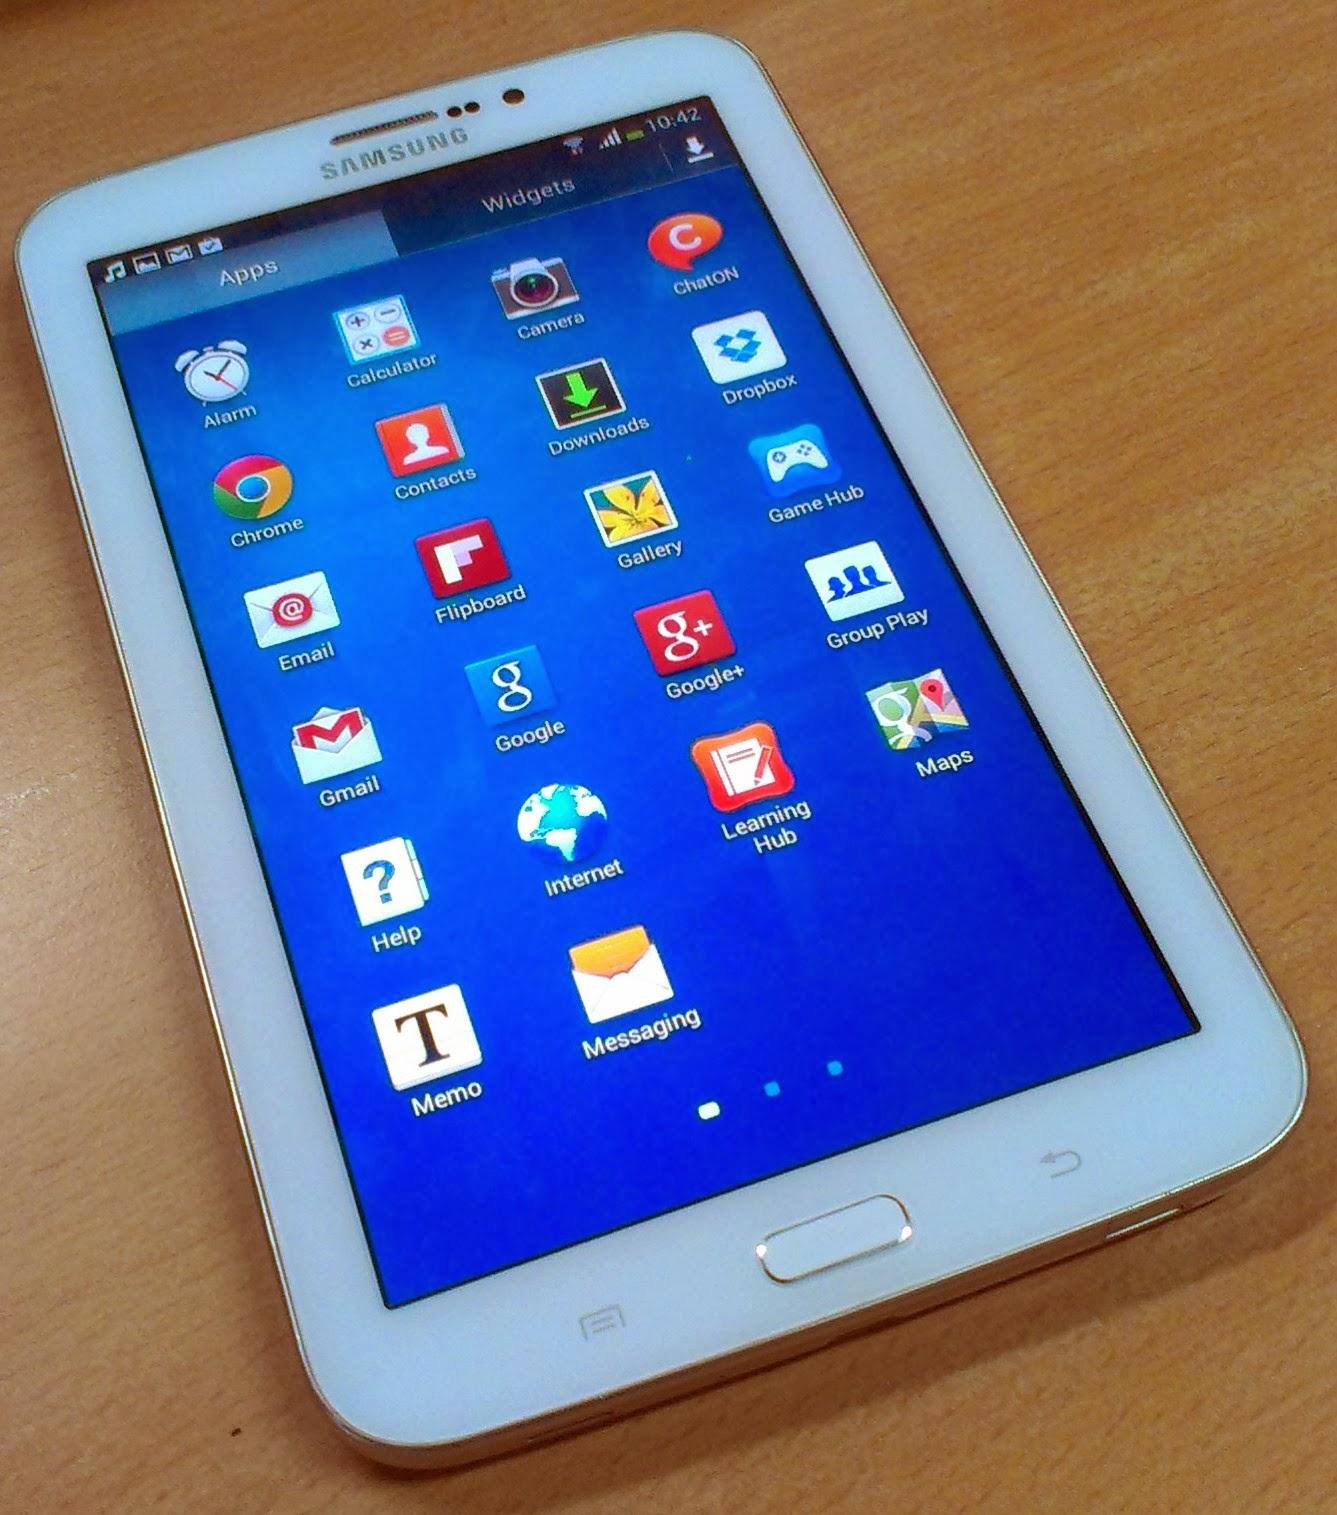 Galaxy tab 3 tablet review - San diego zoo and safari park